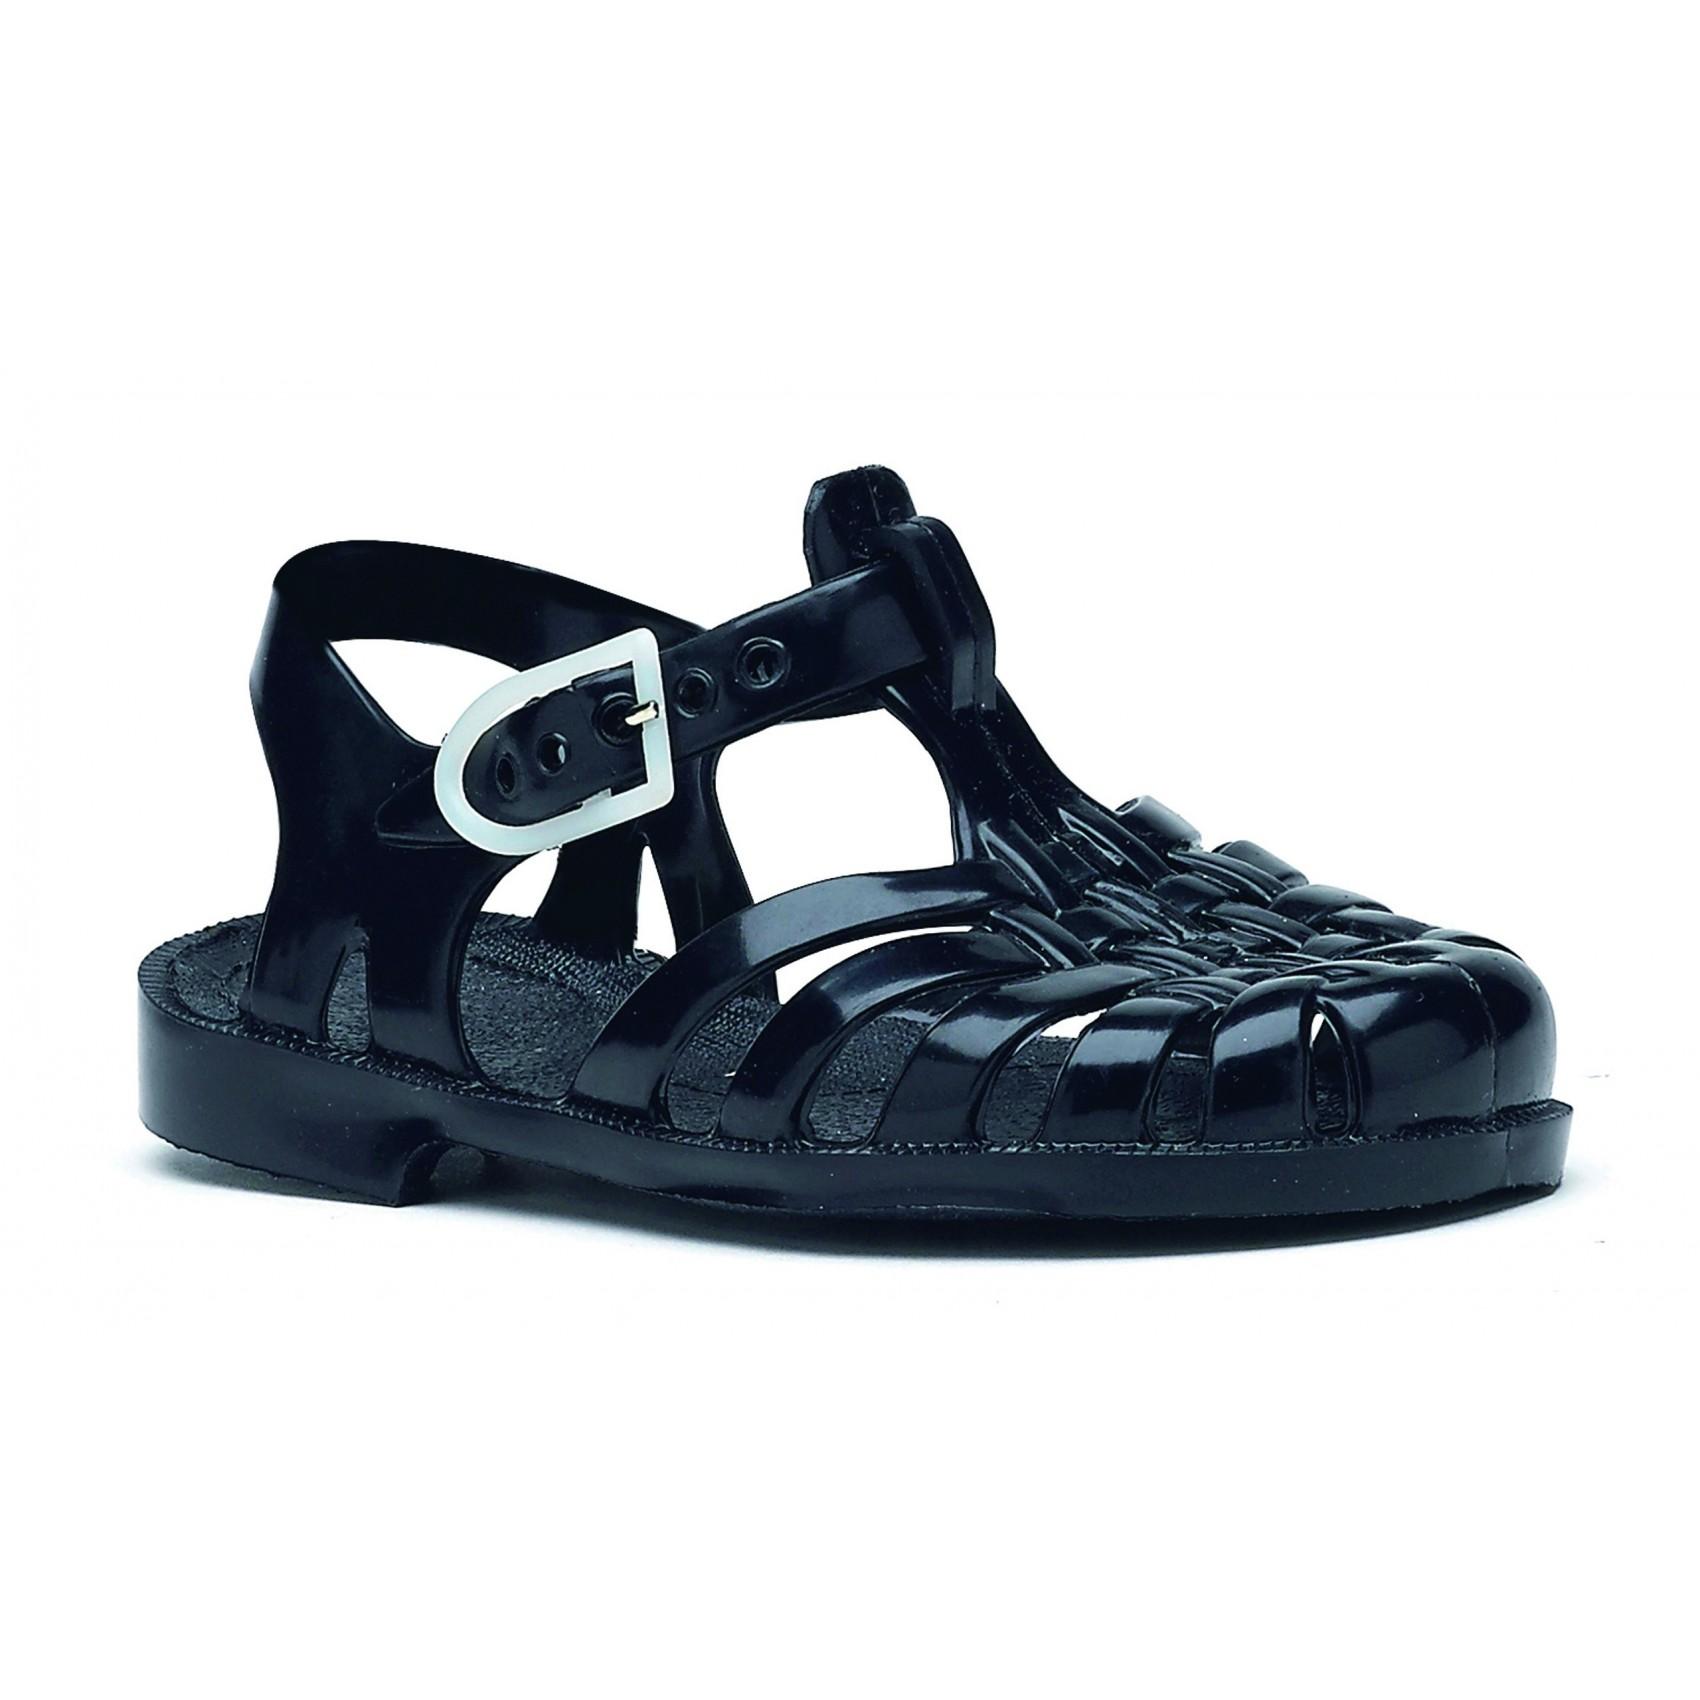 Sandalias De Sandalias Méduse Baño Negro Baño De Méduse Negro Nk08wnPXO